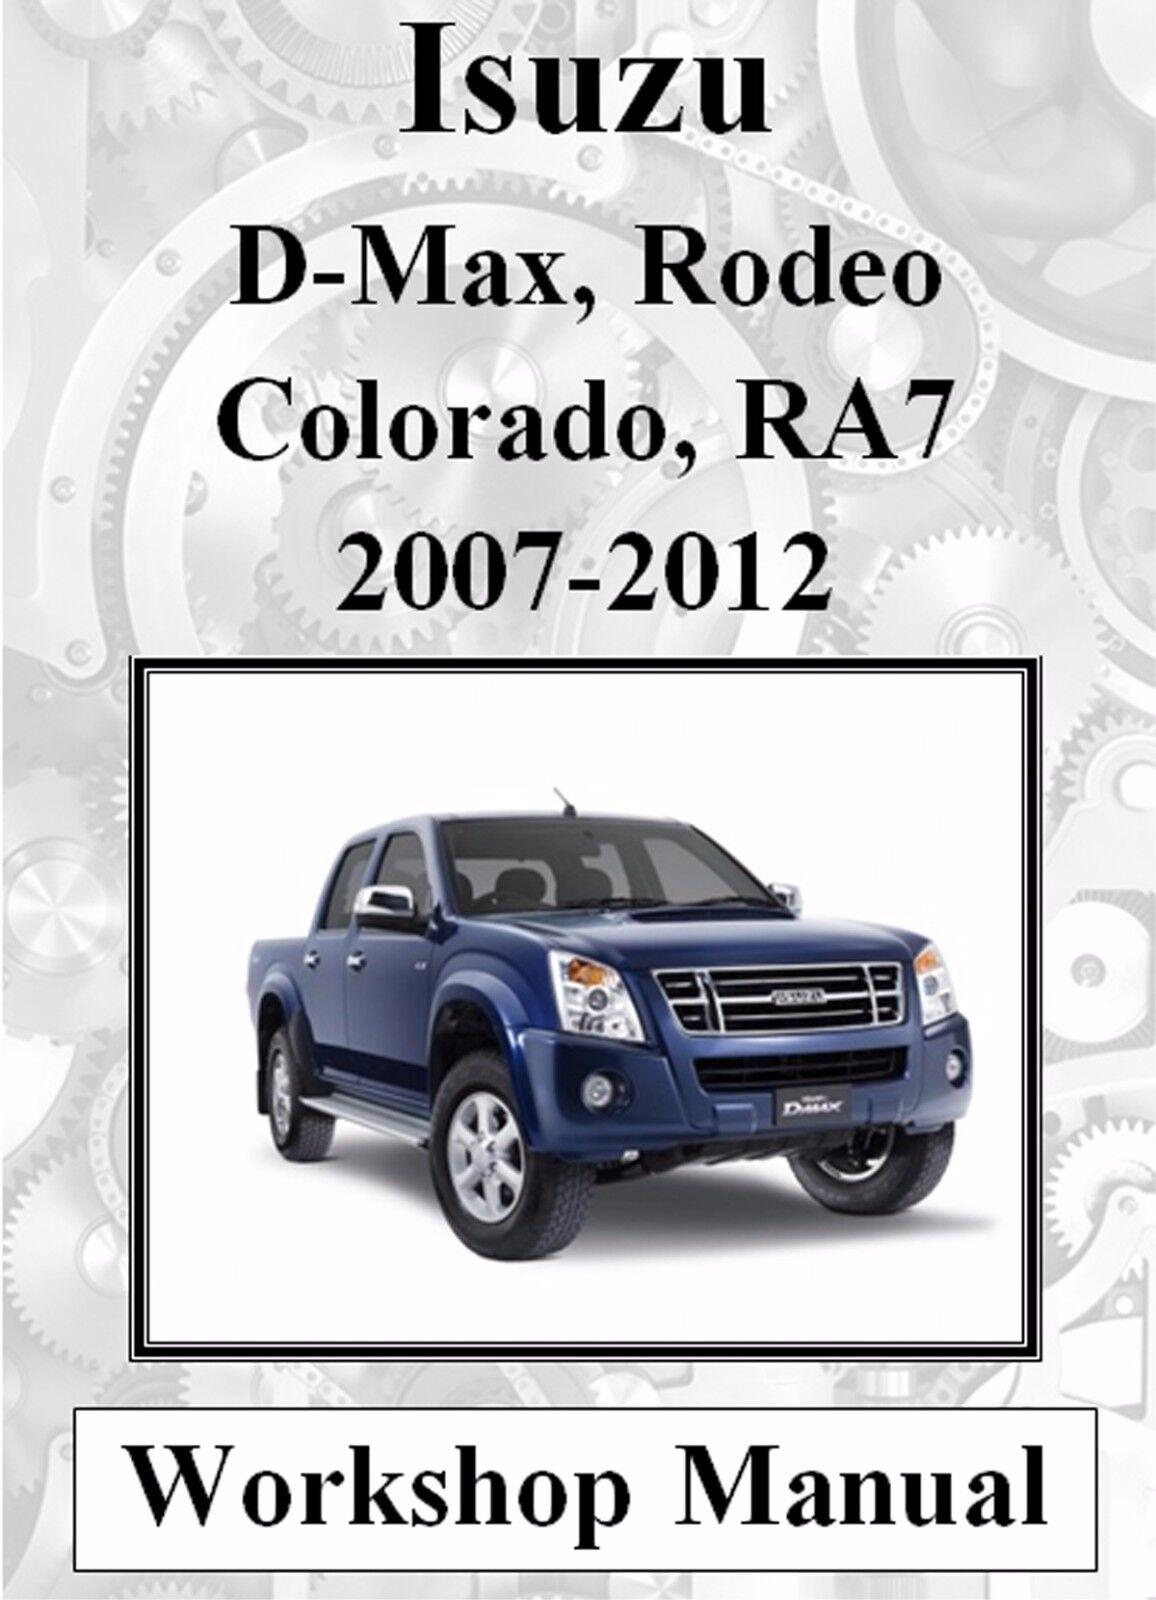 ISUZU D-MAX RODEO HOLDEN COLORADO 2007-2012 WORKSHOP MANUAL